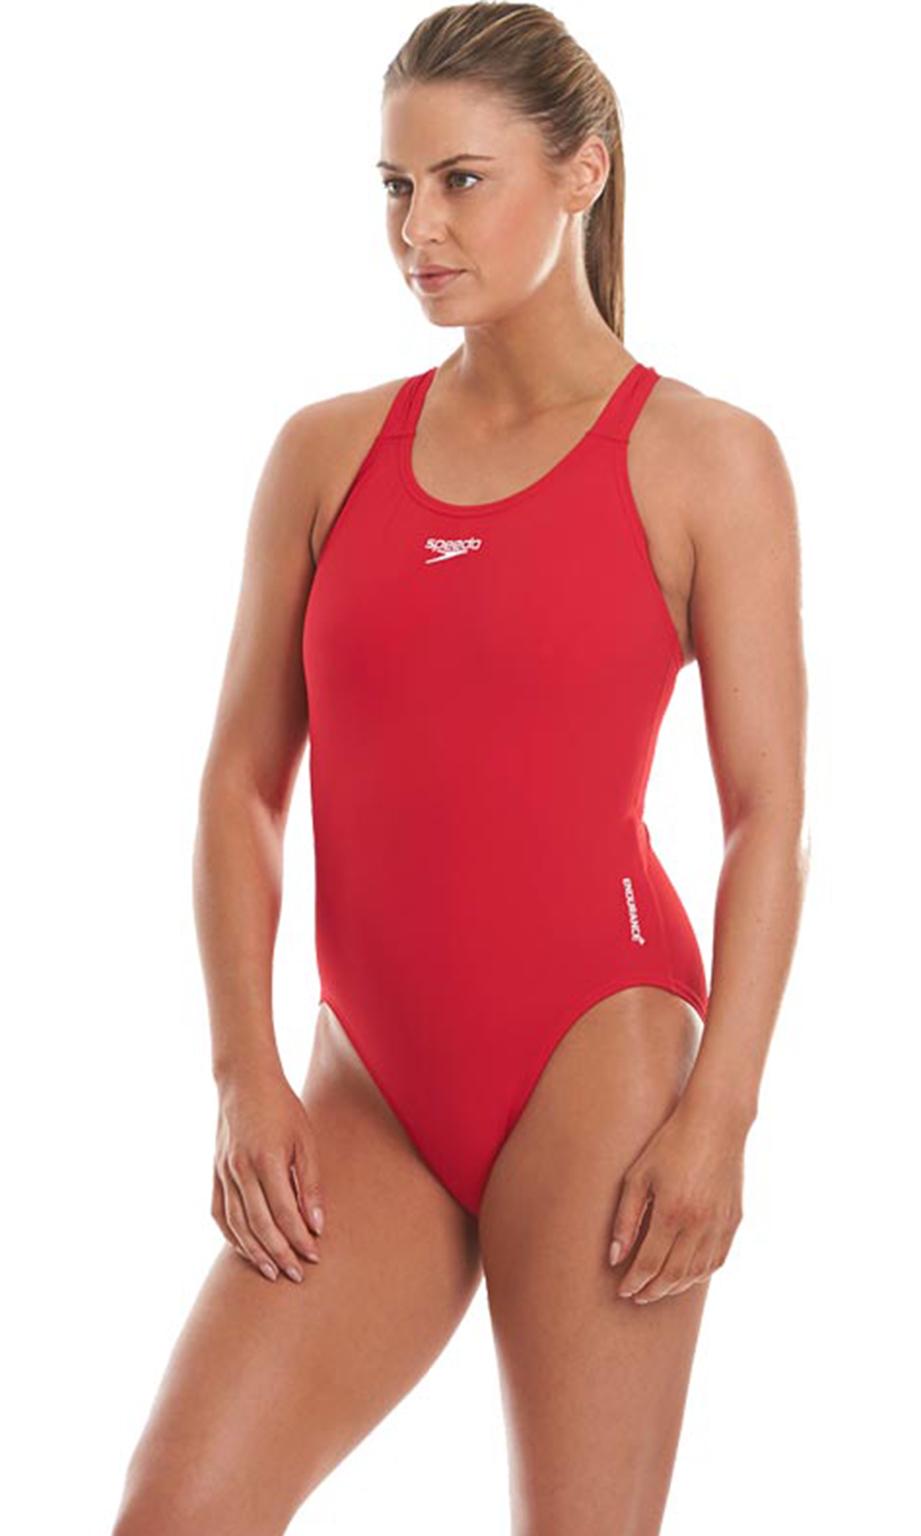 damske-sportove-plavky-speedo-medalist-endurance-plus